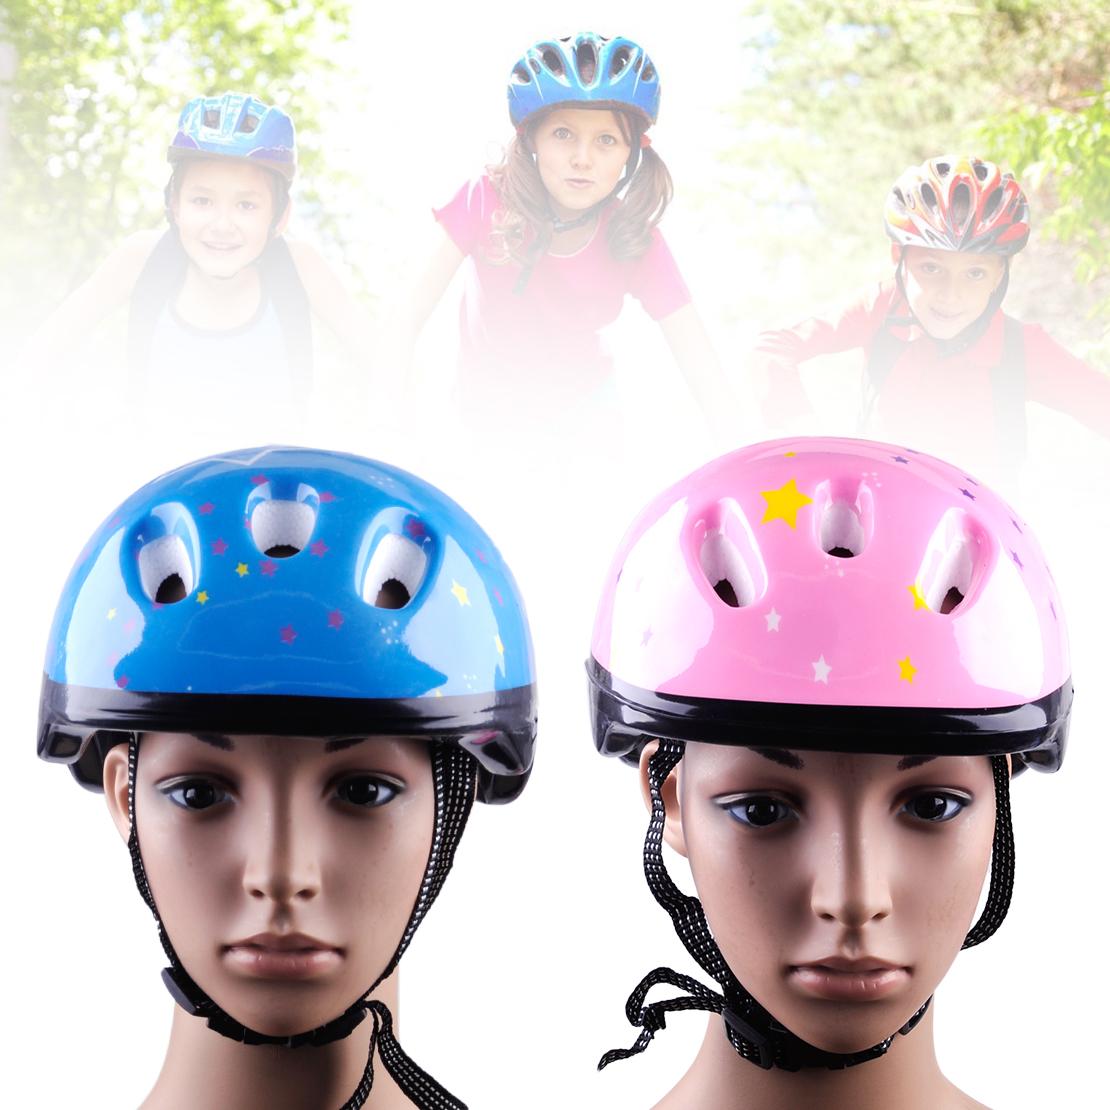 kinder helm fahrradhelm schutzhelm jungen m dchen. Black Bedroom Furniture Sets. Home Design Ideas